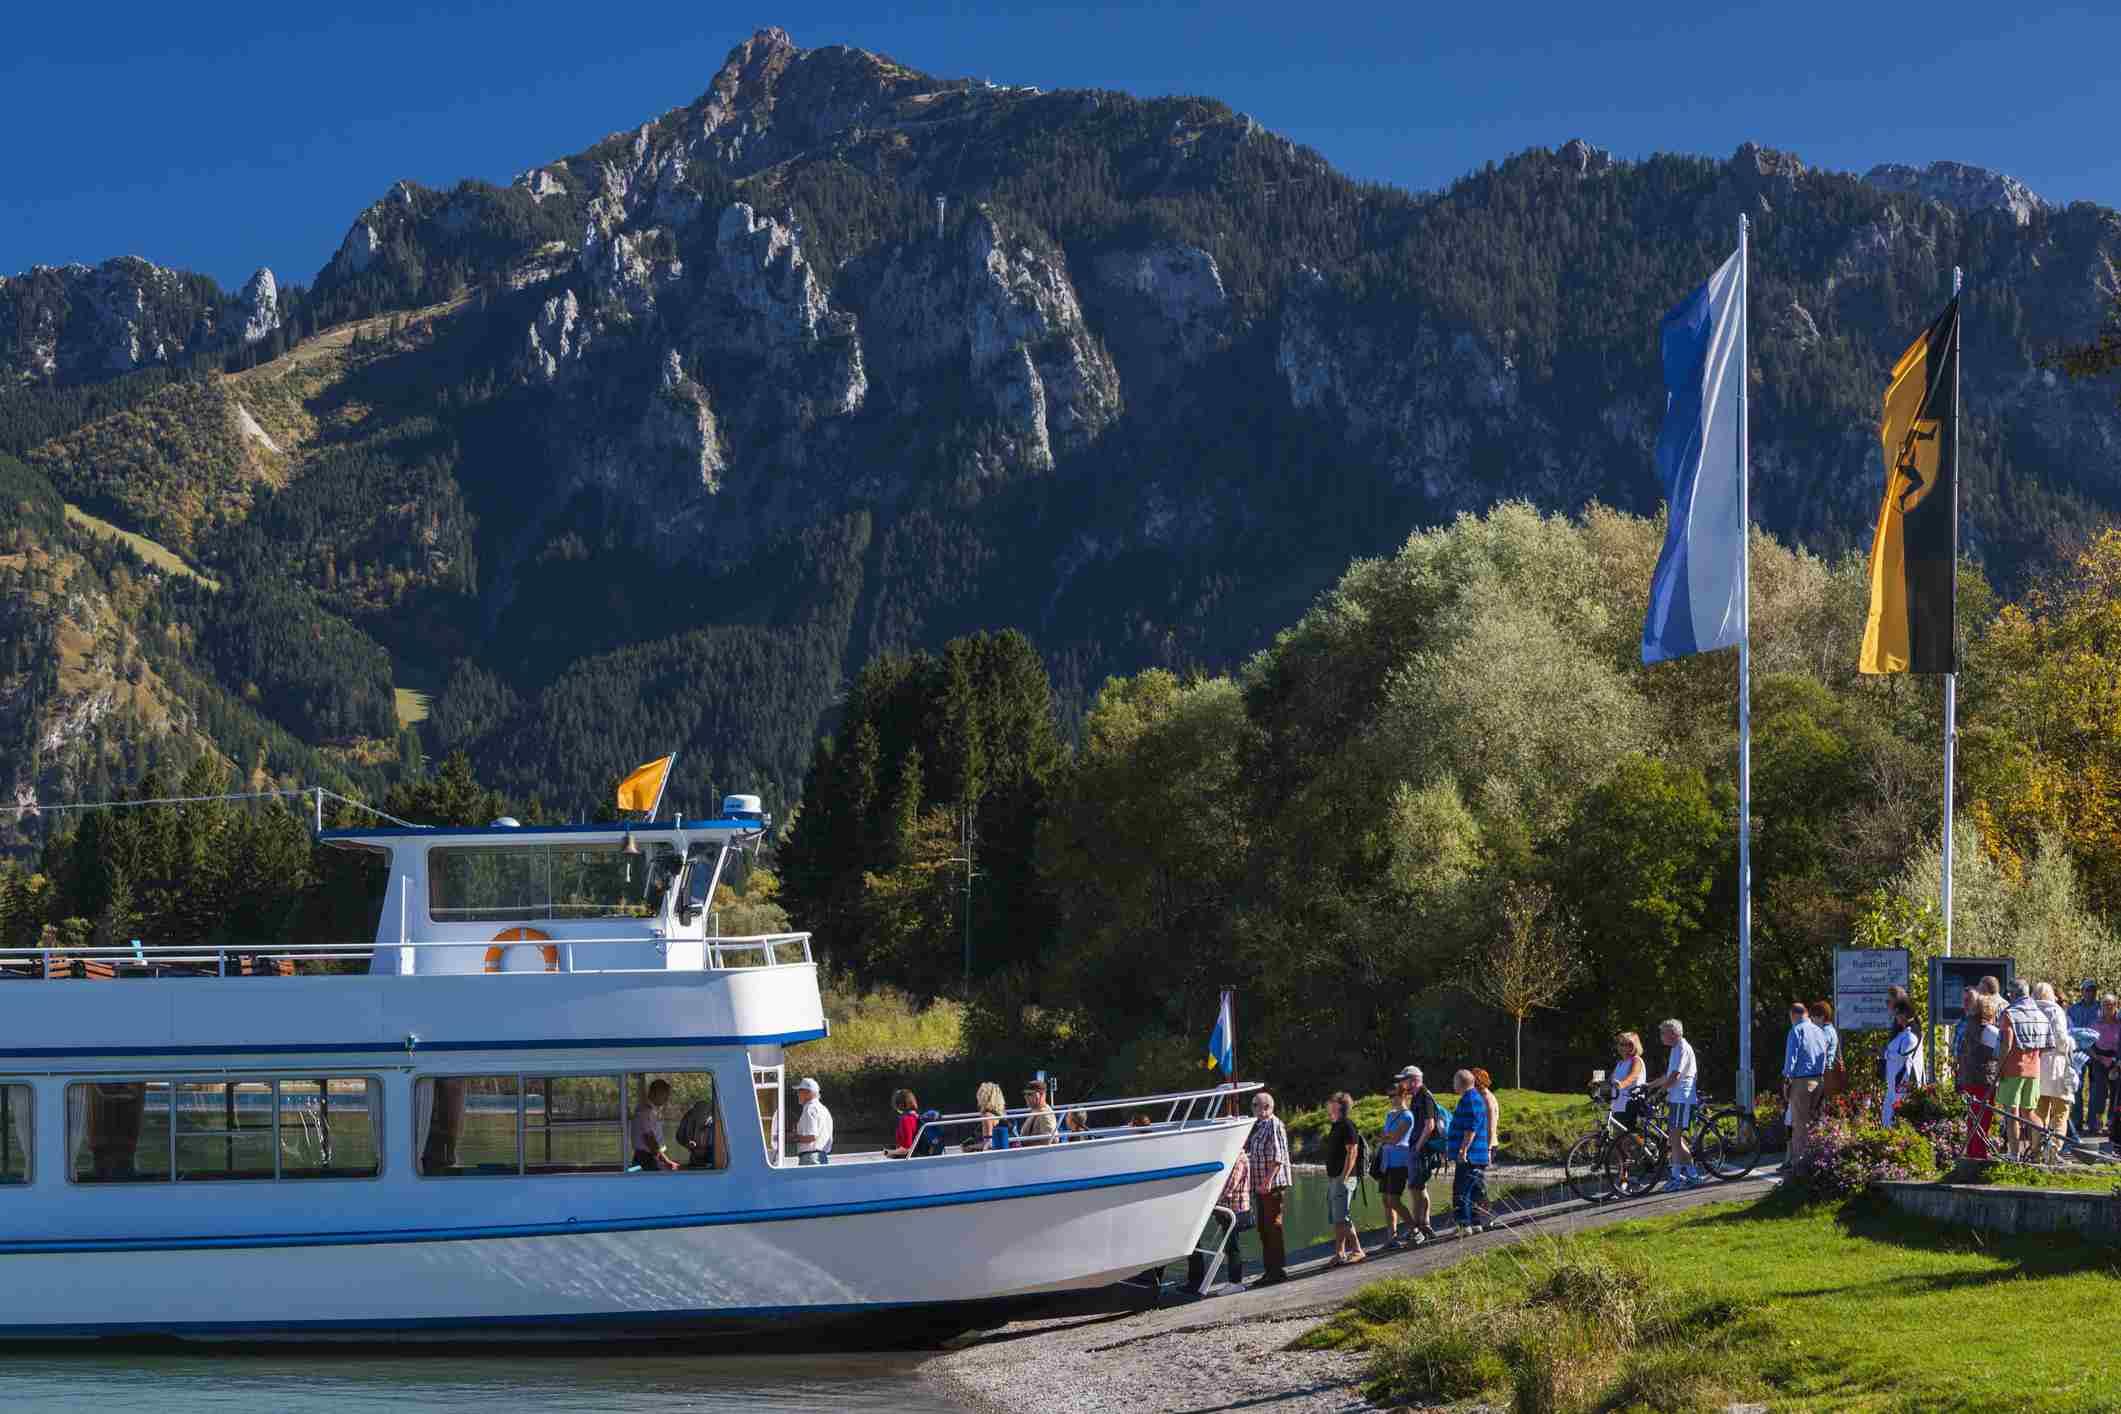 Forggensee Cruise in Bavaria